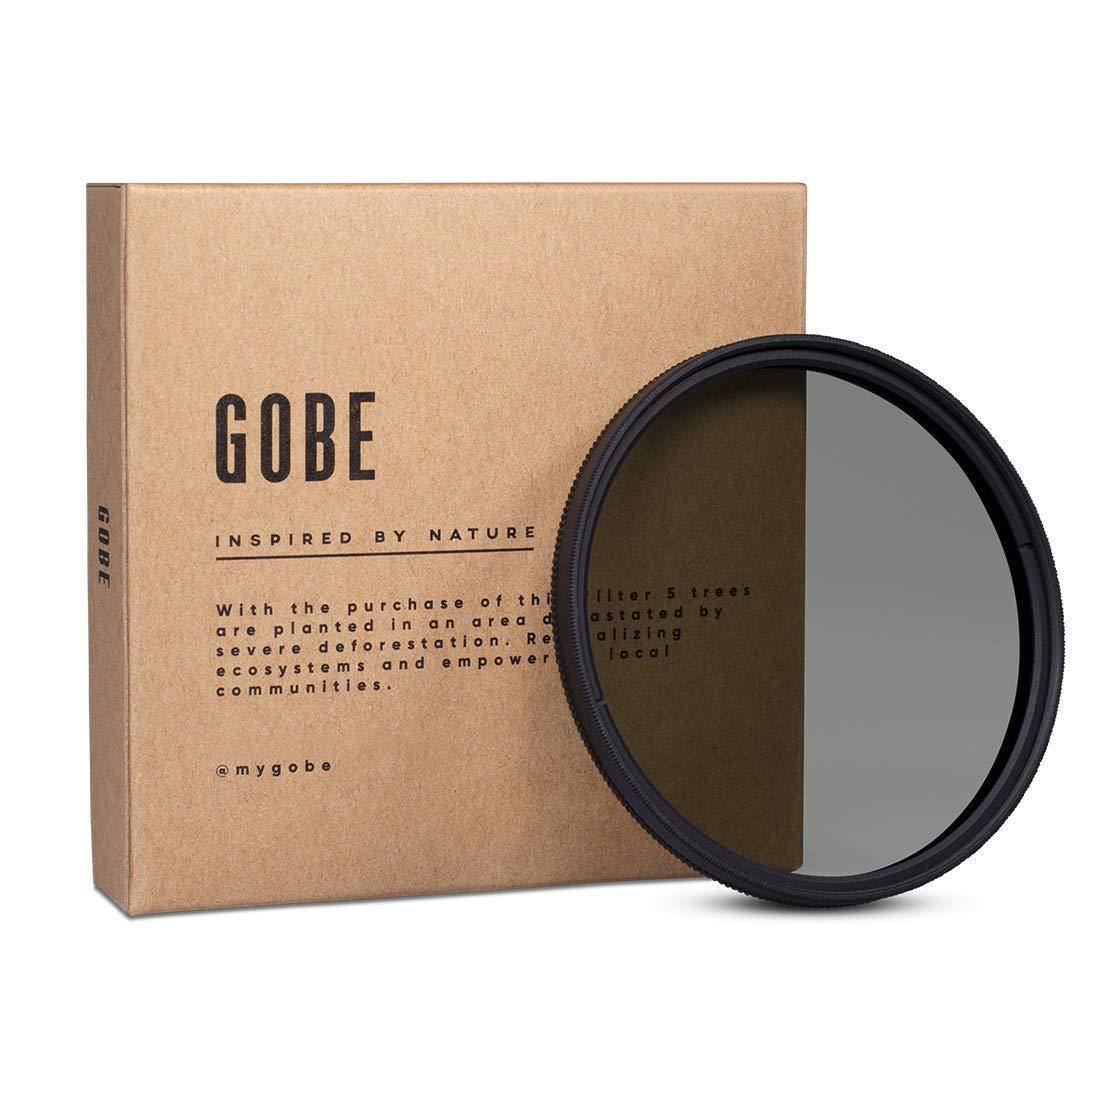 Gobe CPL 37mm ジャパンオプティクス 16層マルチコート偏光フィルター 37mm  B014SIVG84